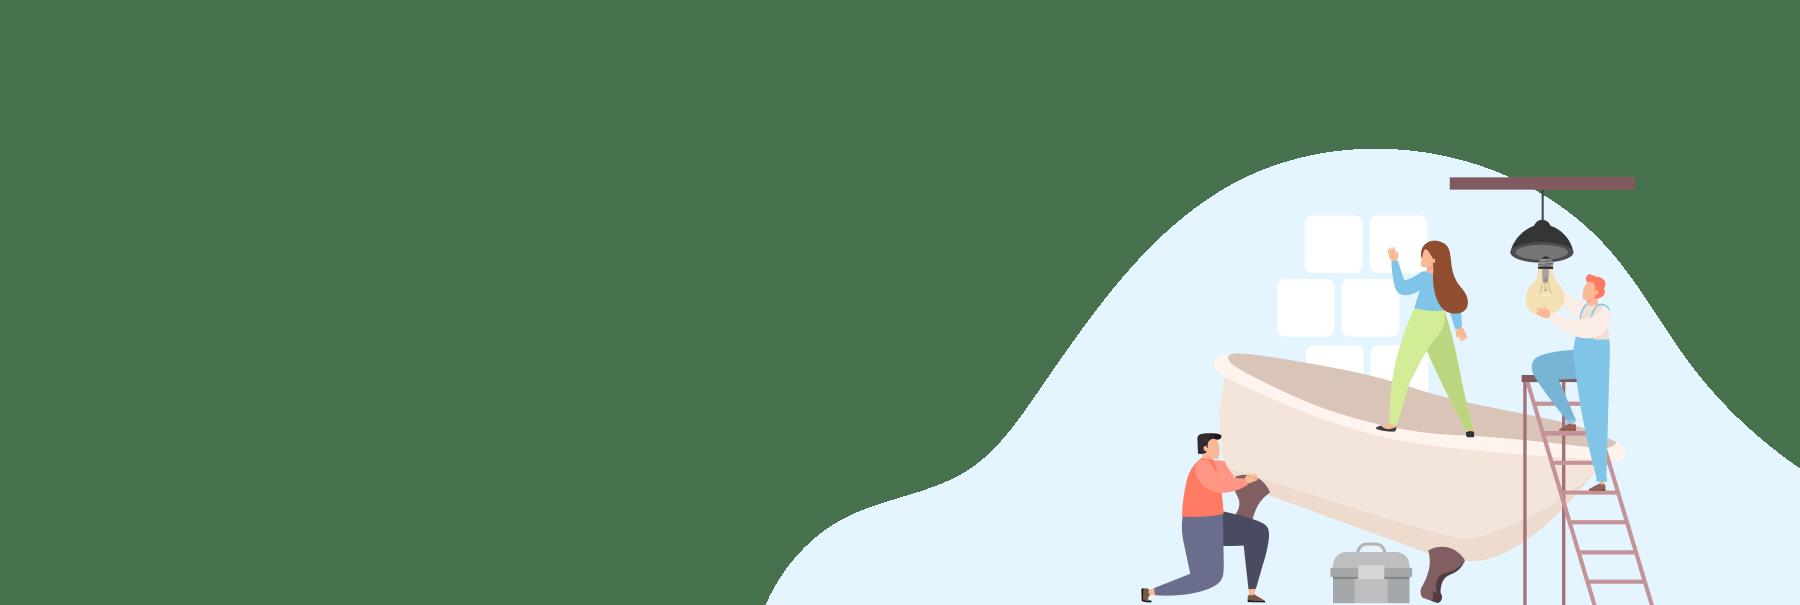 Upgrade/Refinance - Hero Banner